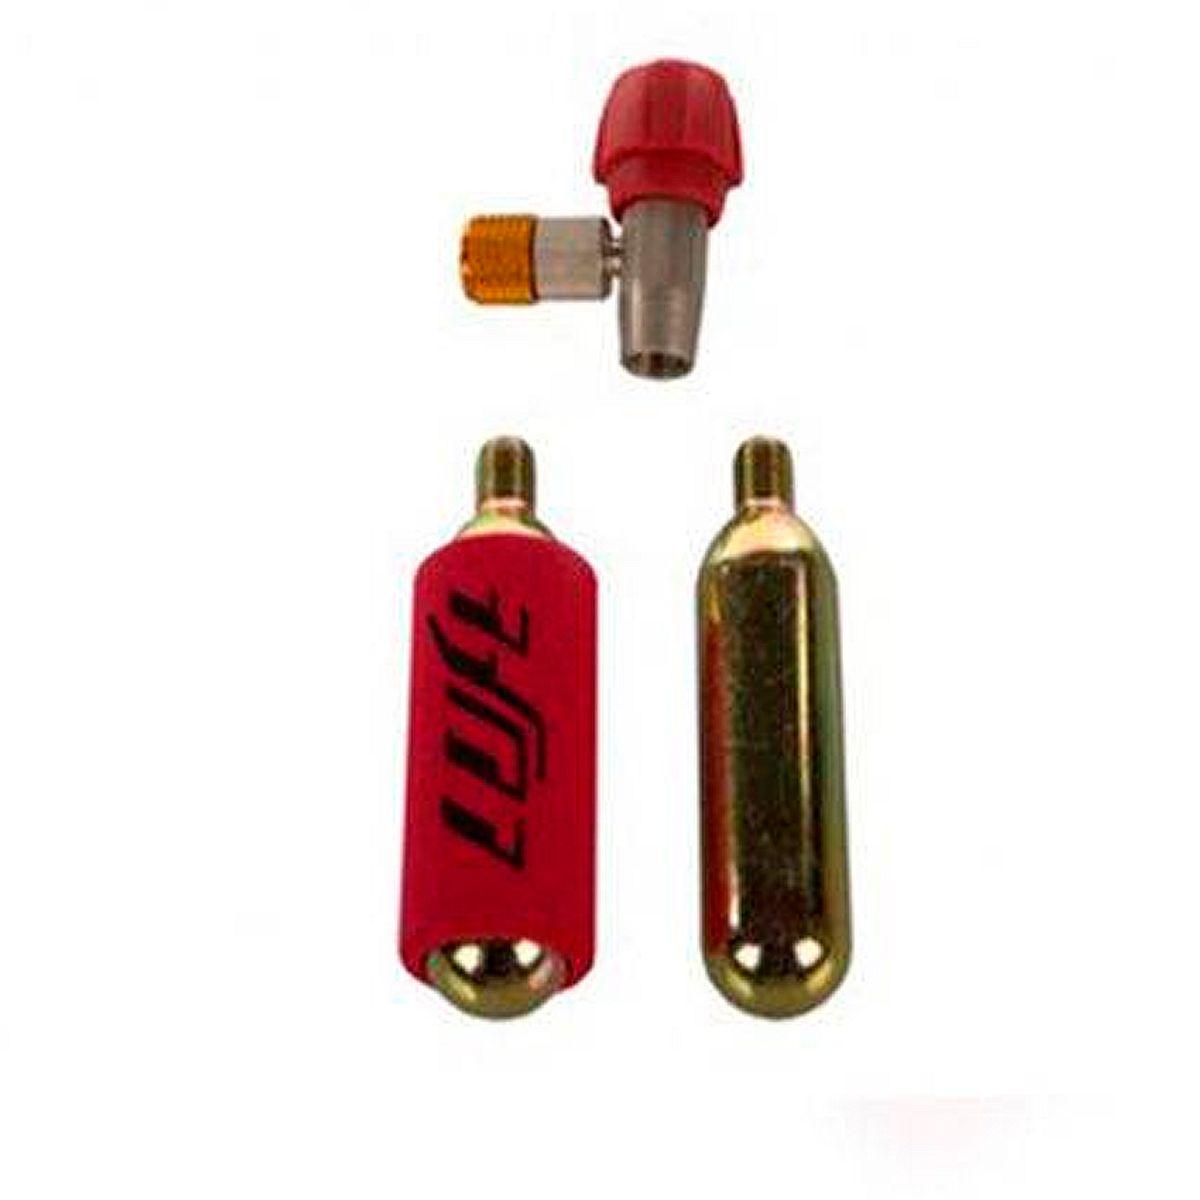 Bomba Luft Lf0111 Co2 Alumínio Cnc + 2 Refis 16 Gramas